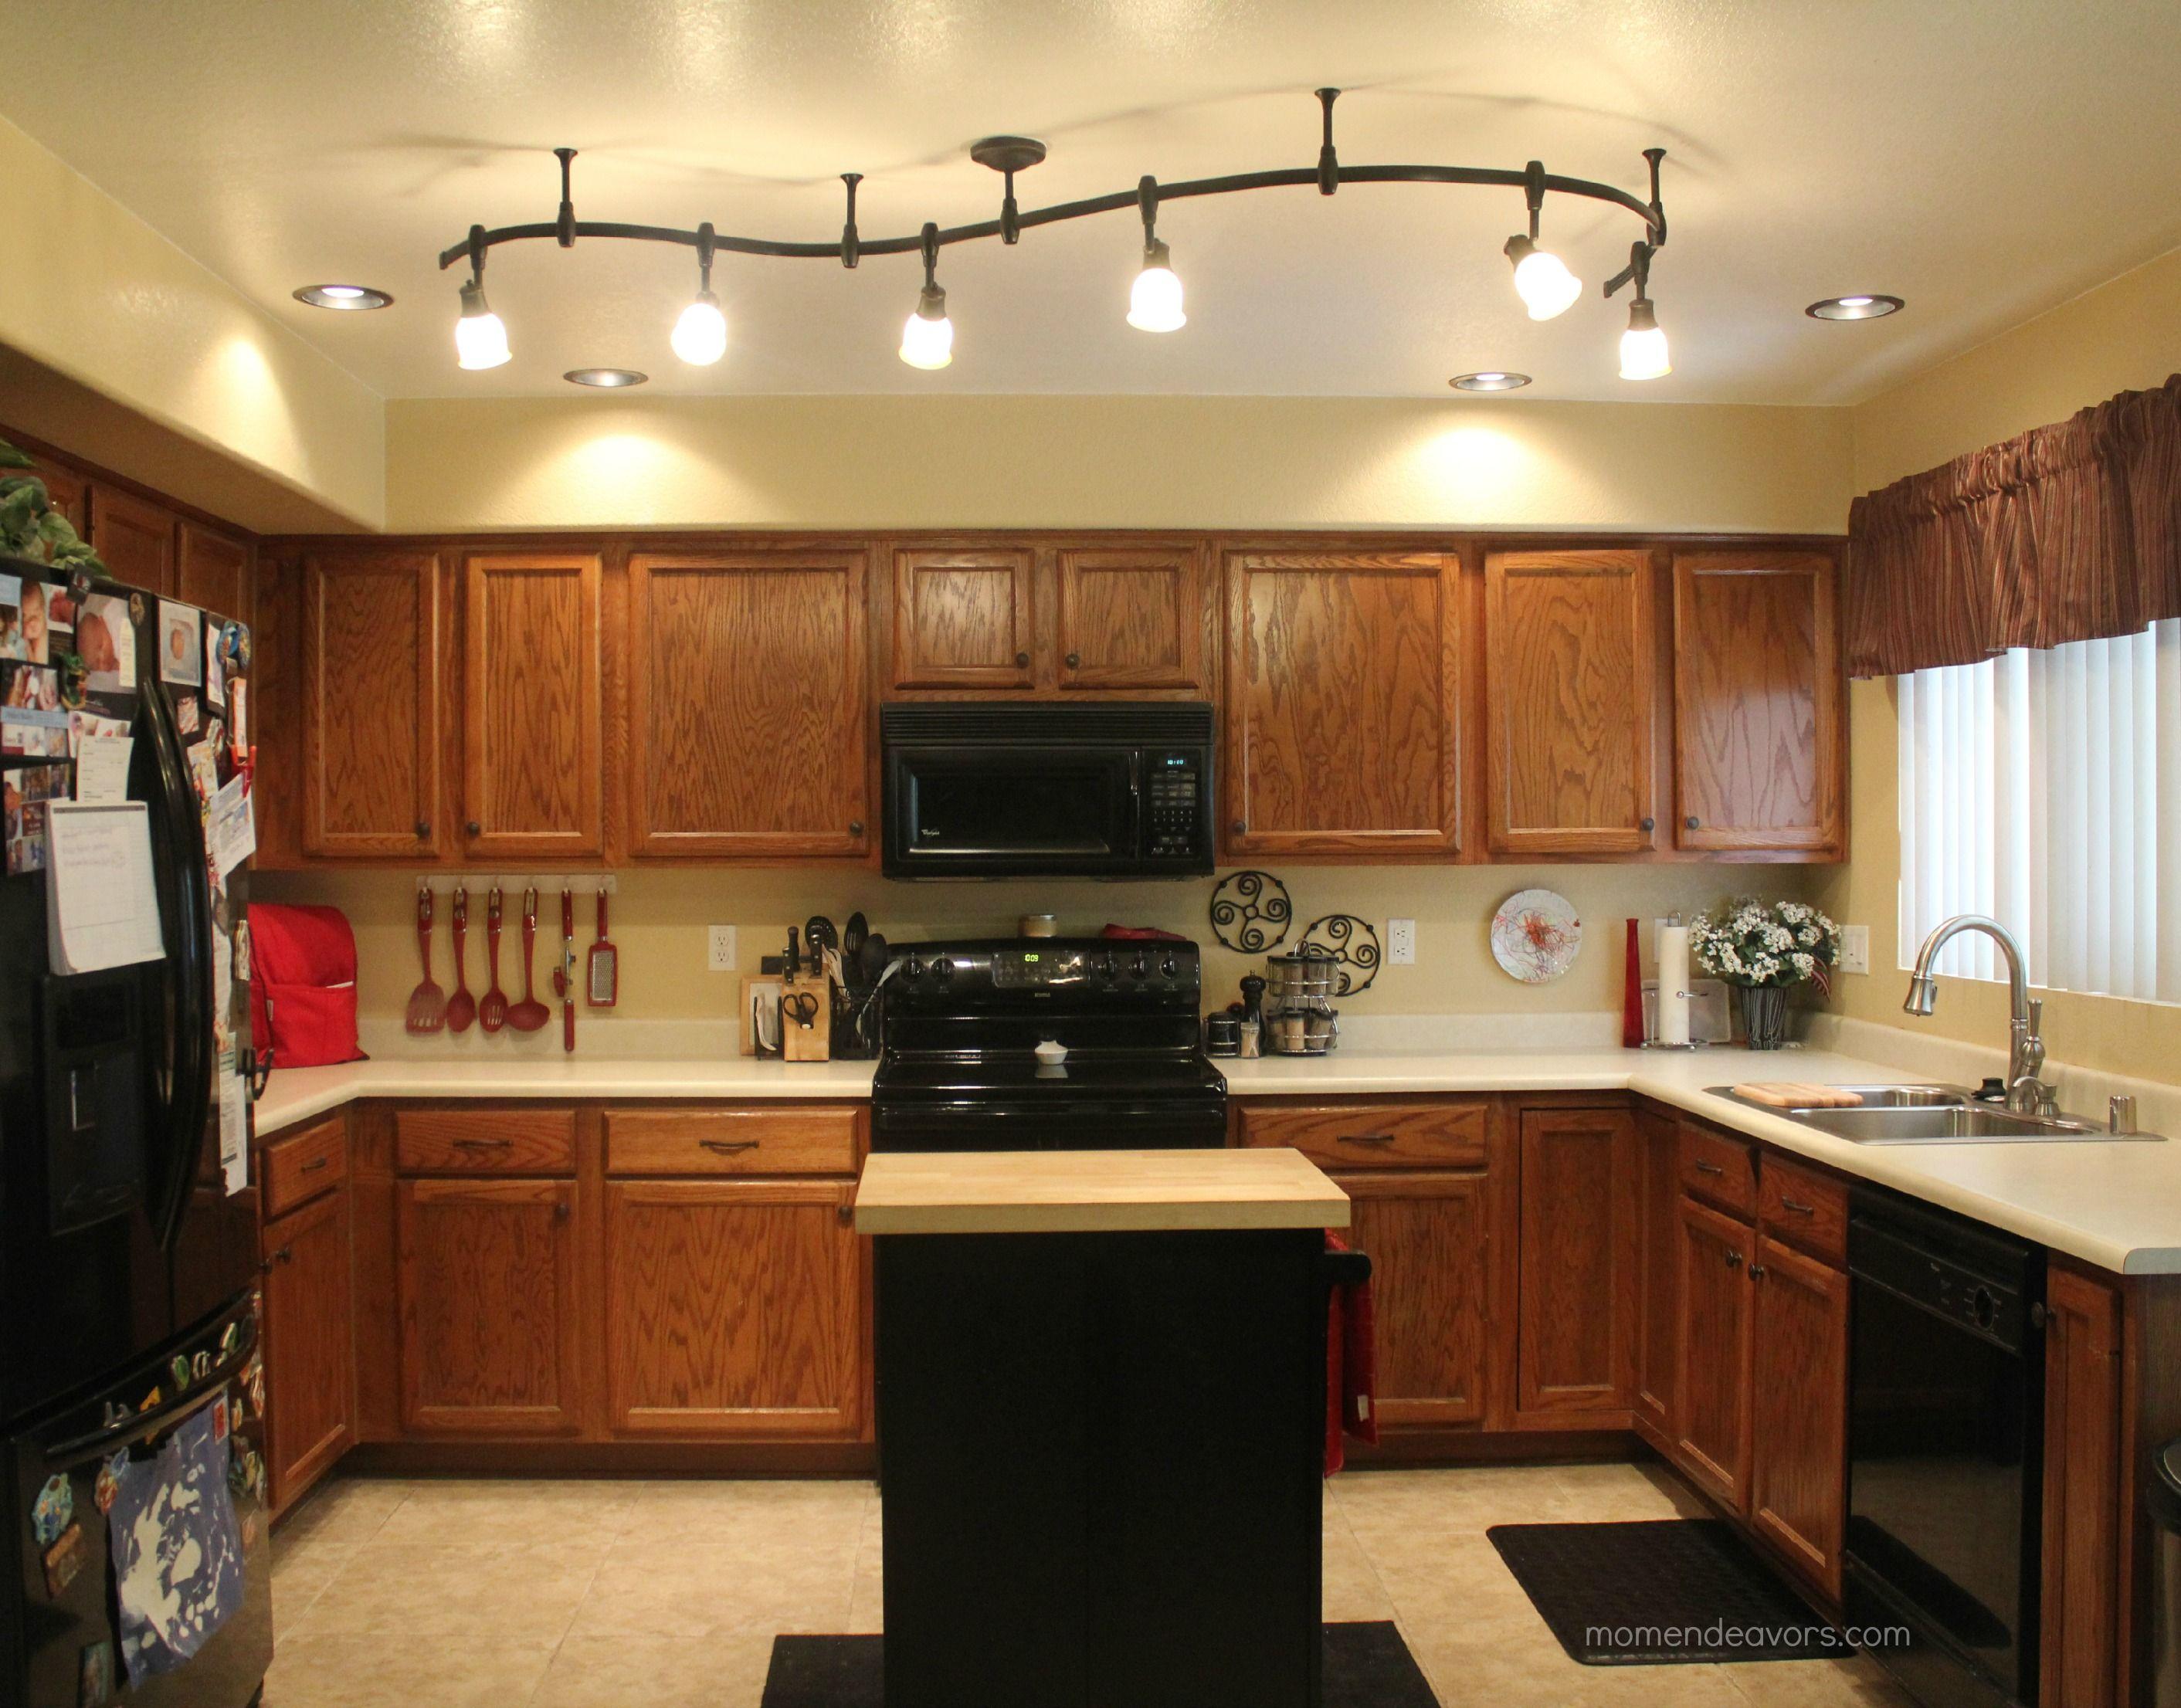 lighting kitchen lighting fixtures ceiling 11 Stunning Photos of Kitchen Track Lighting